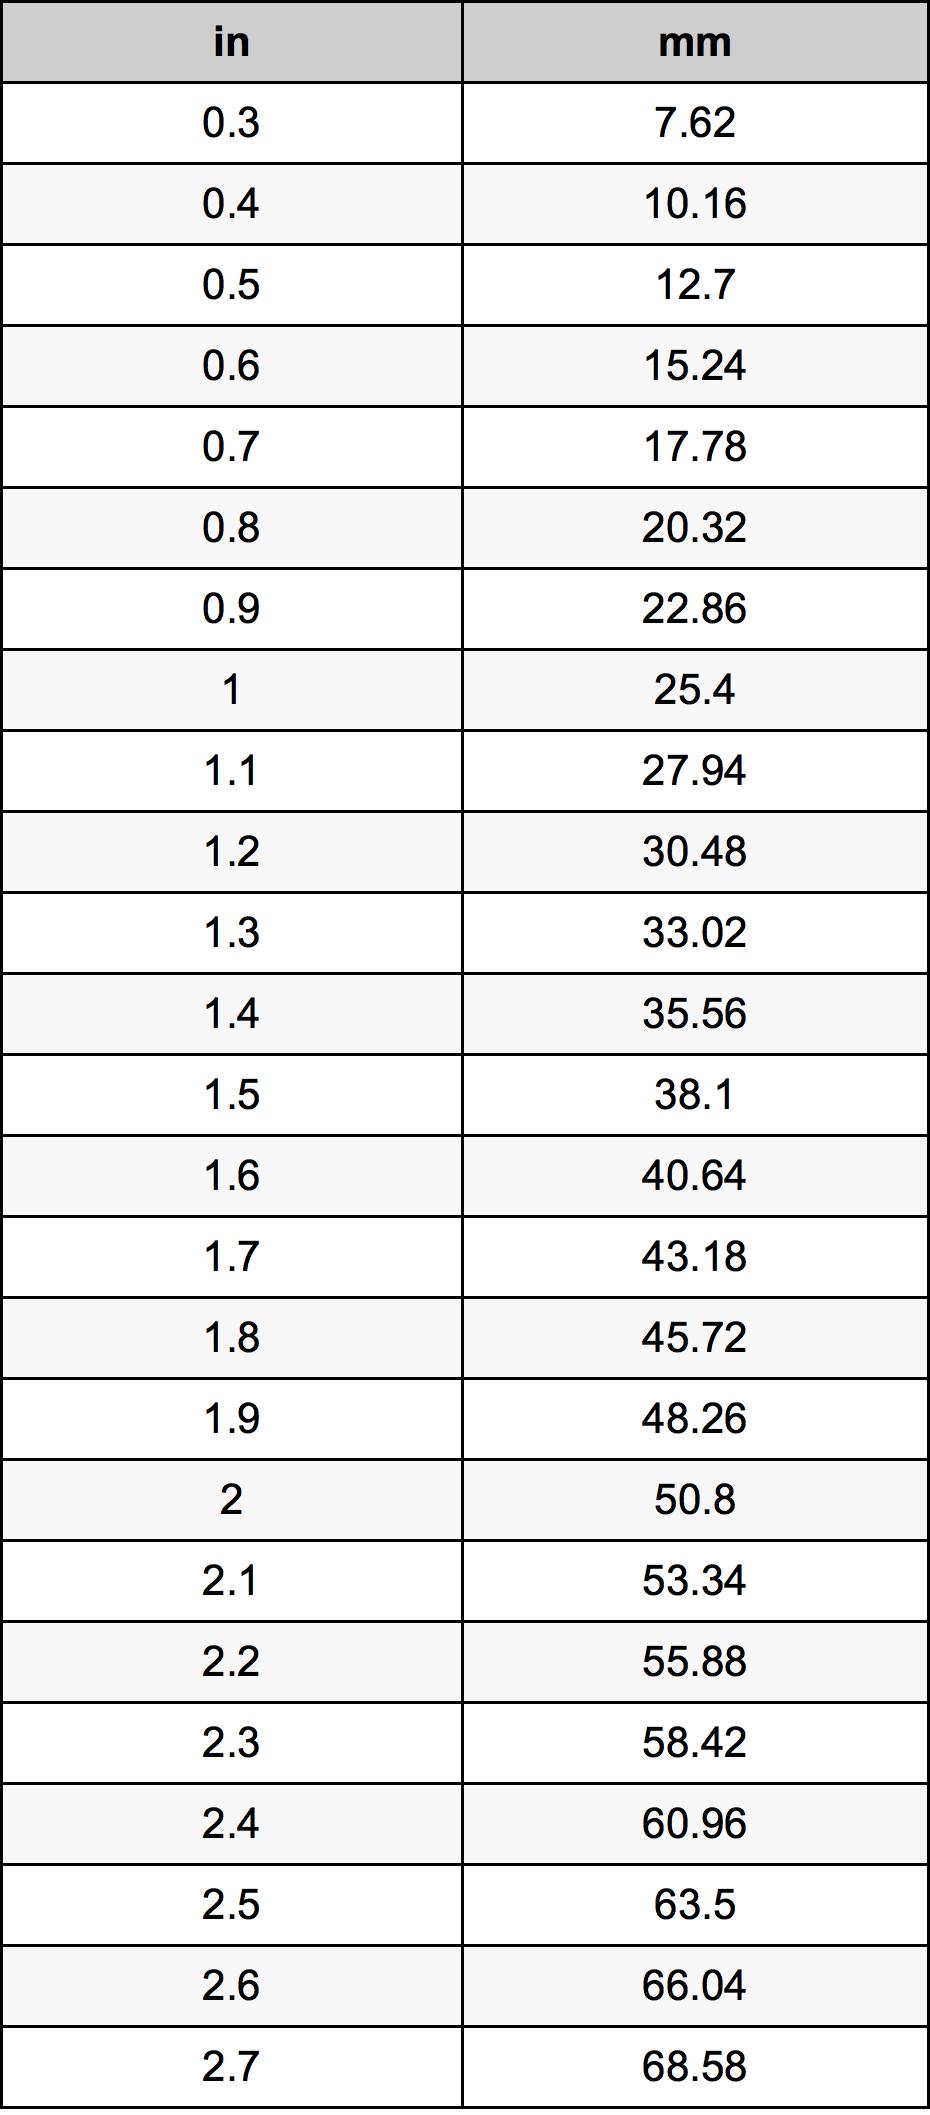 1 5 Pulgadas En Milímetros Conversor De Unidades 1 5 In En Mm Conversor De Unidades